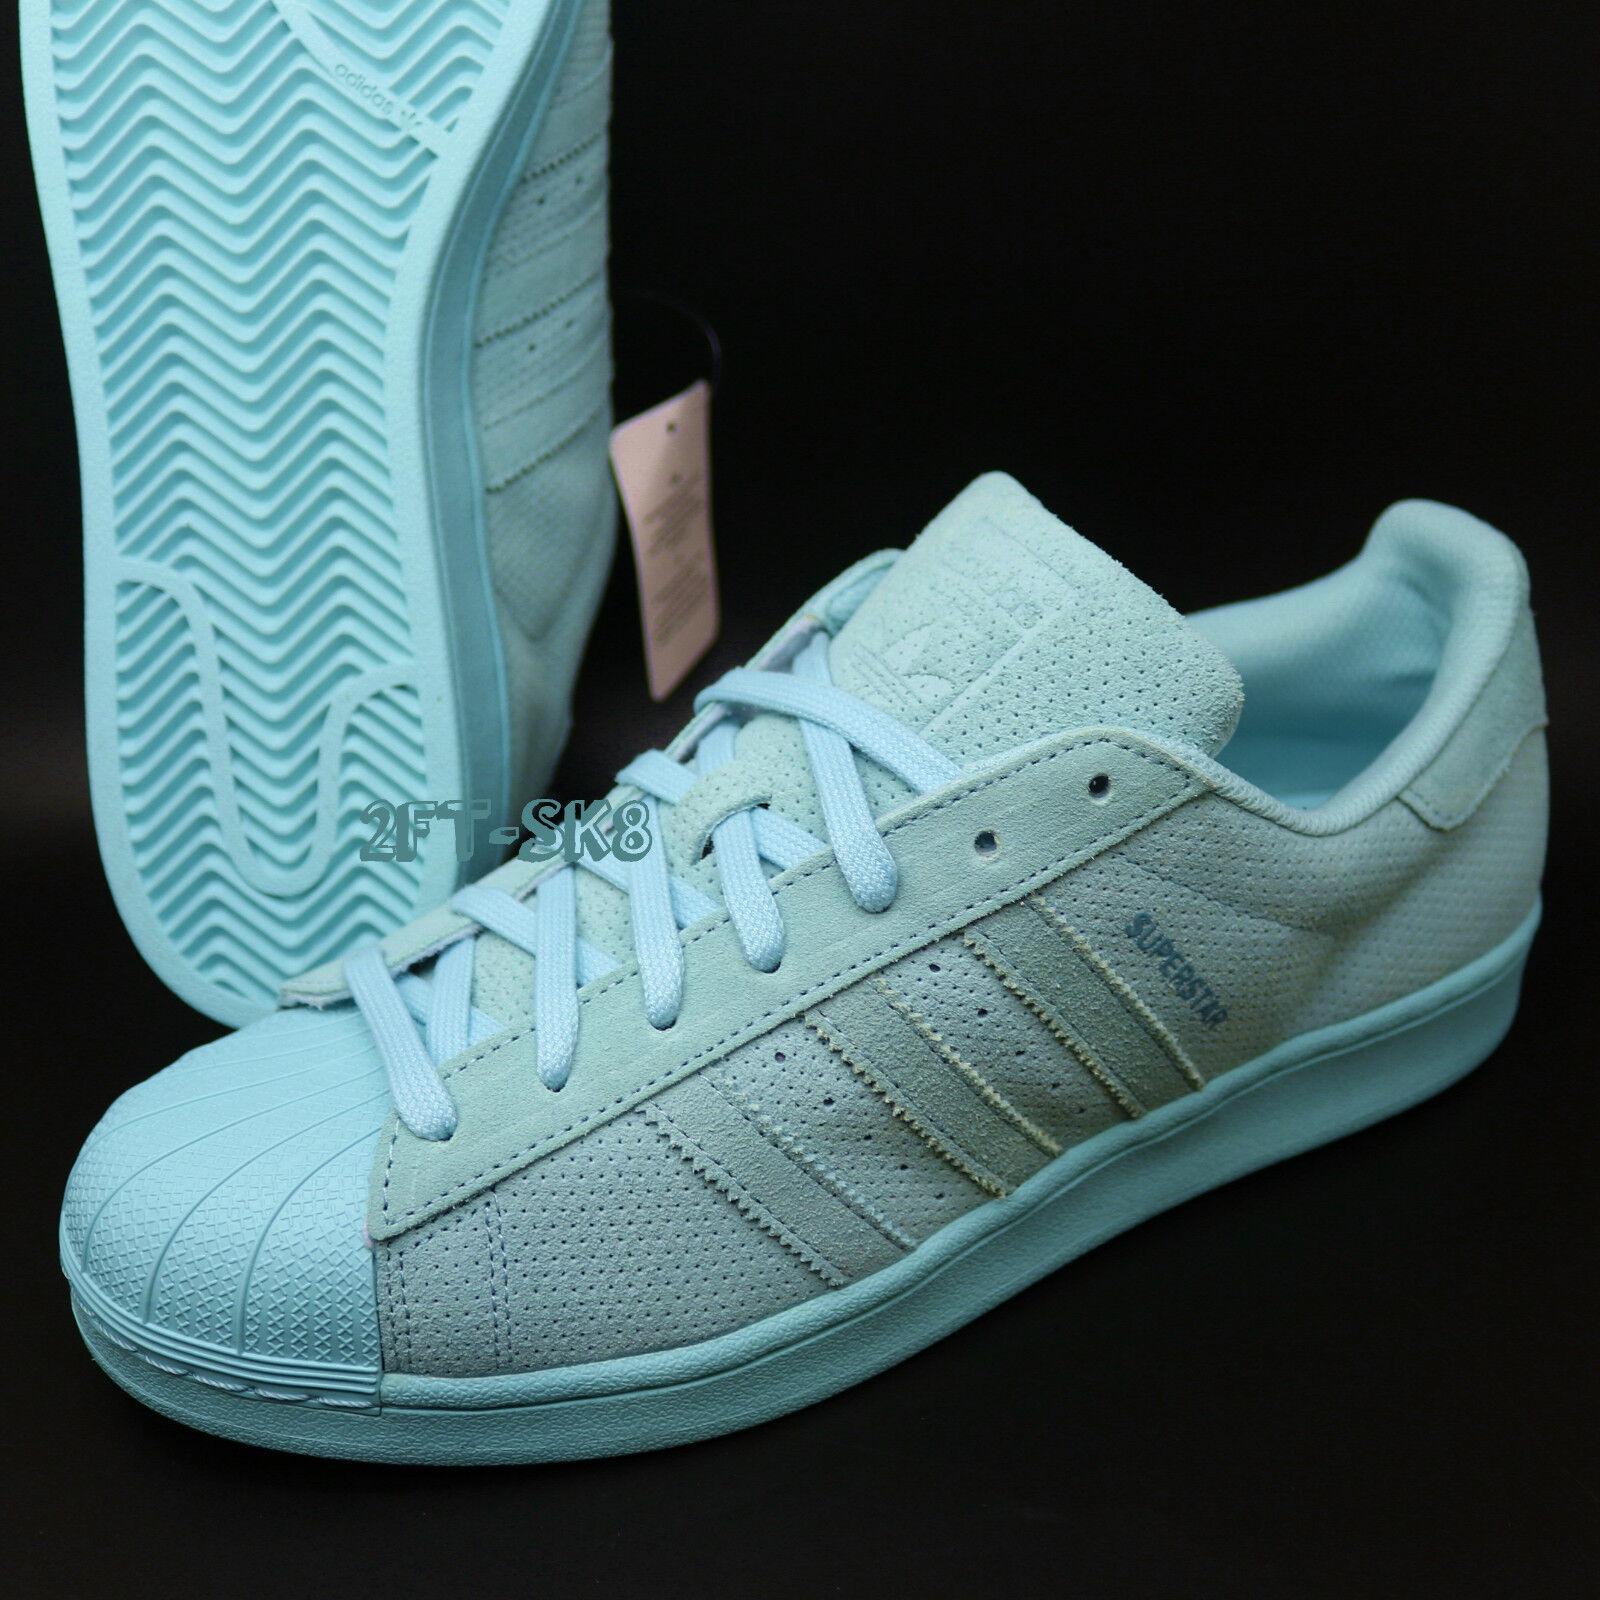 Adidas Originals SUPERSTAR SUEDE MONO Clear Aqua size 10.5   s89272.237